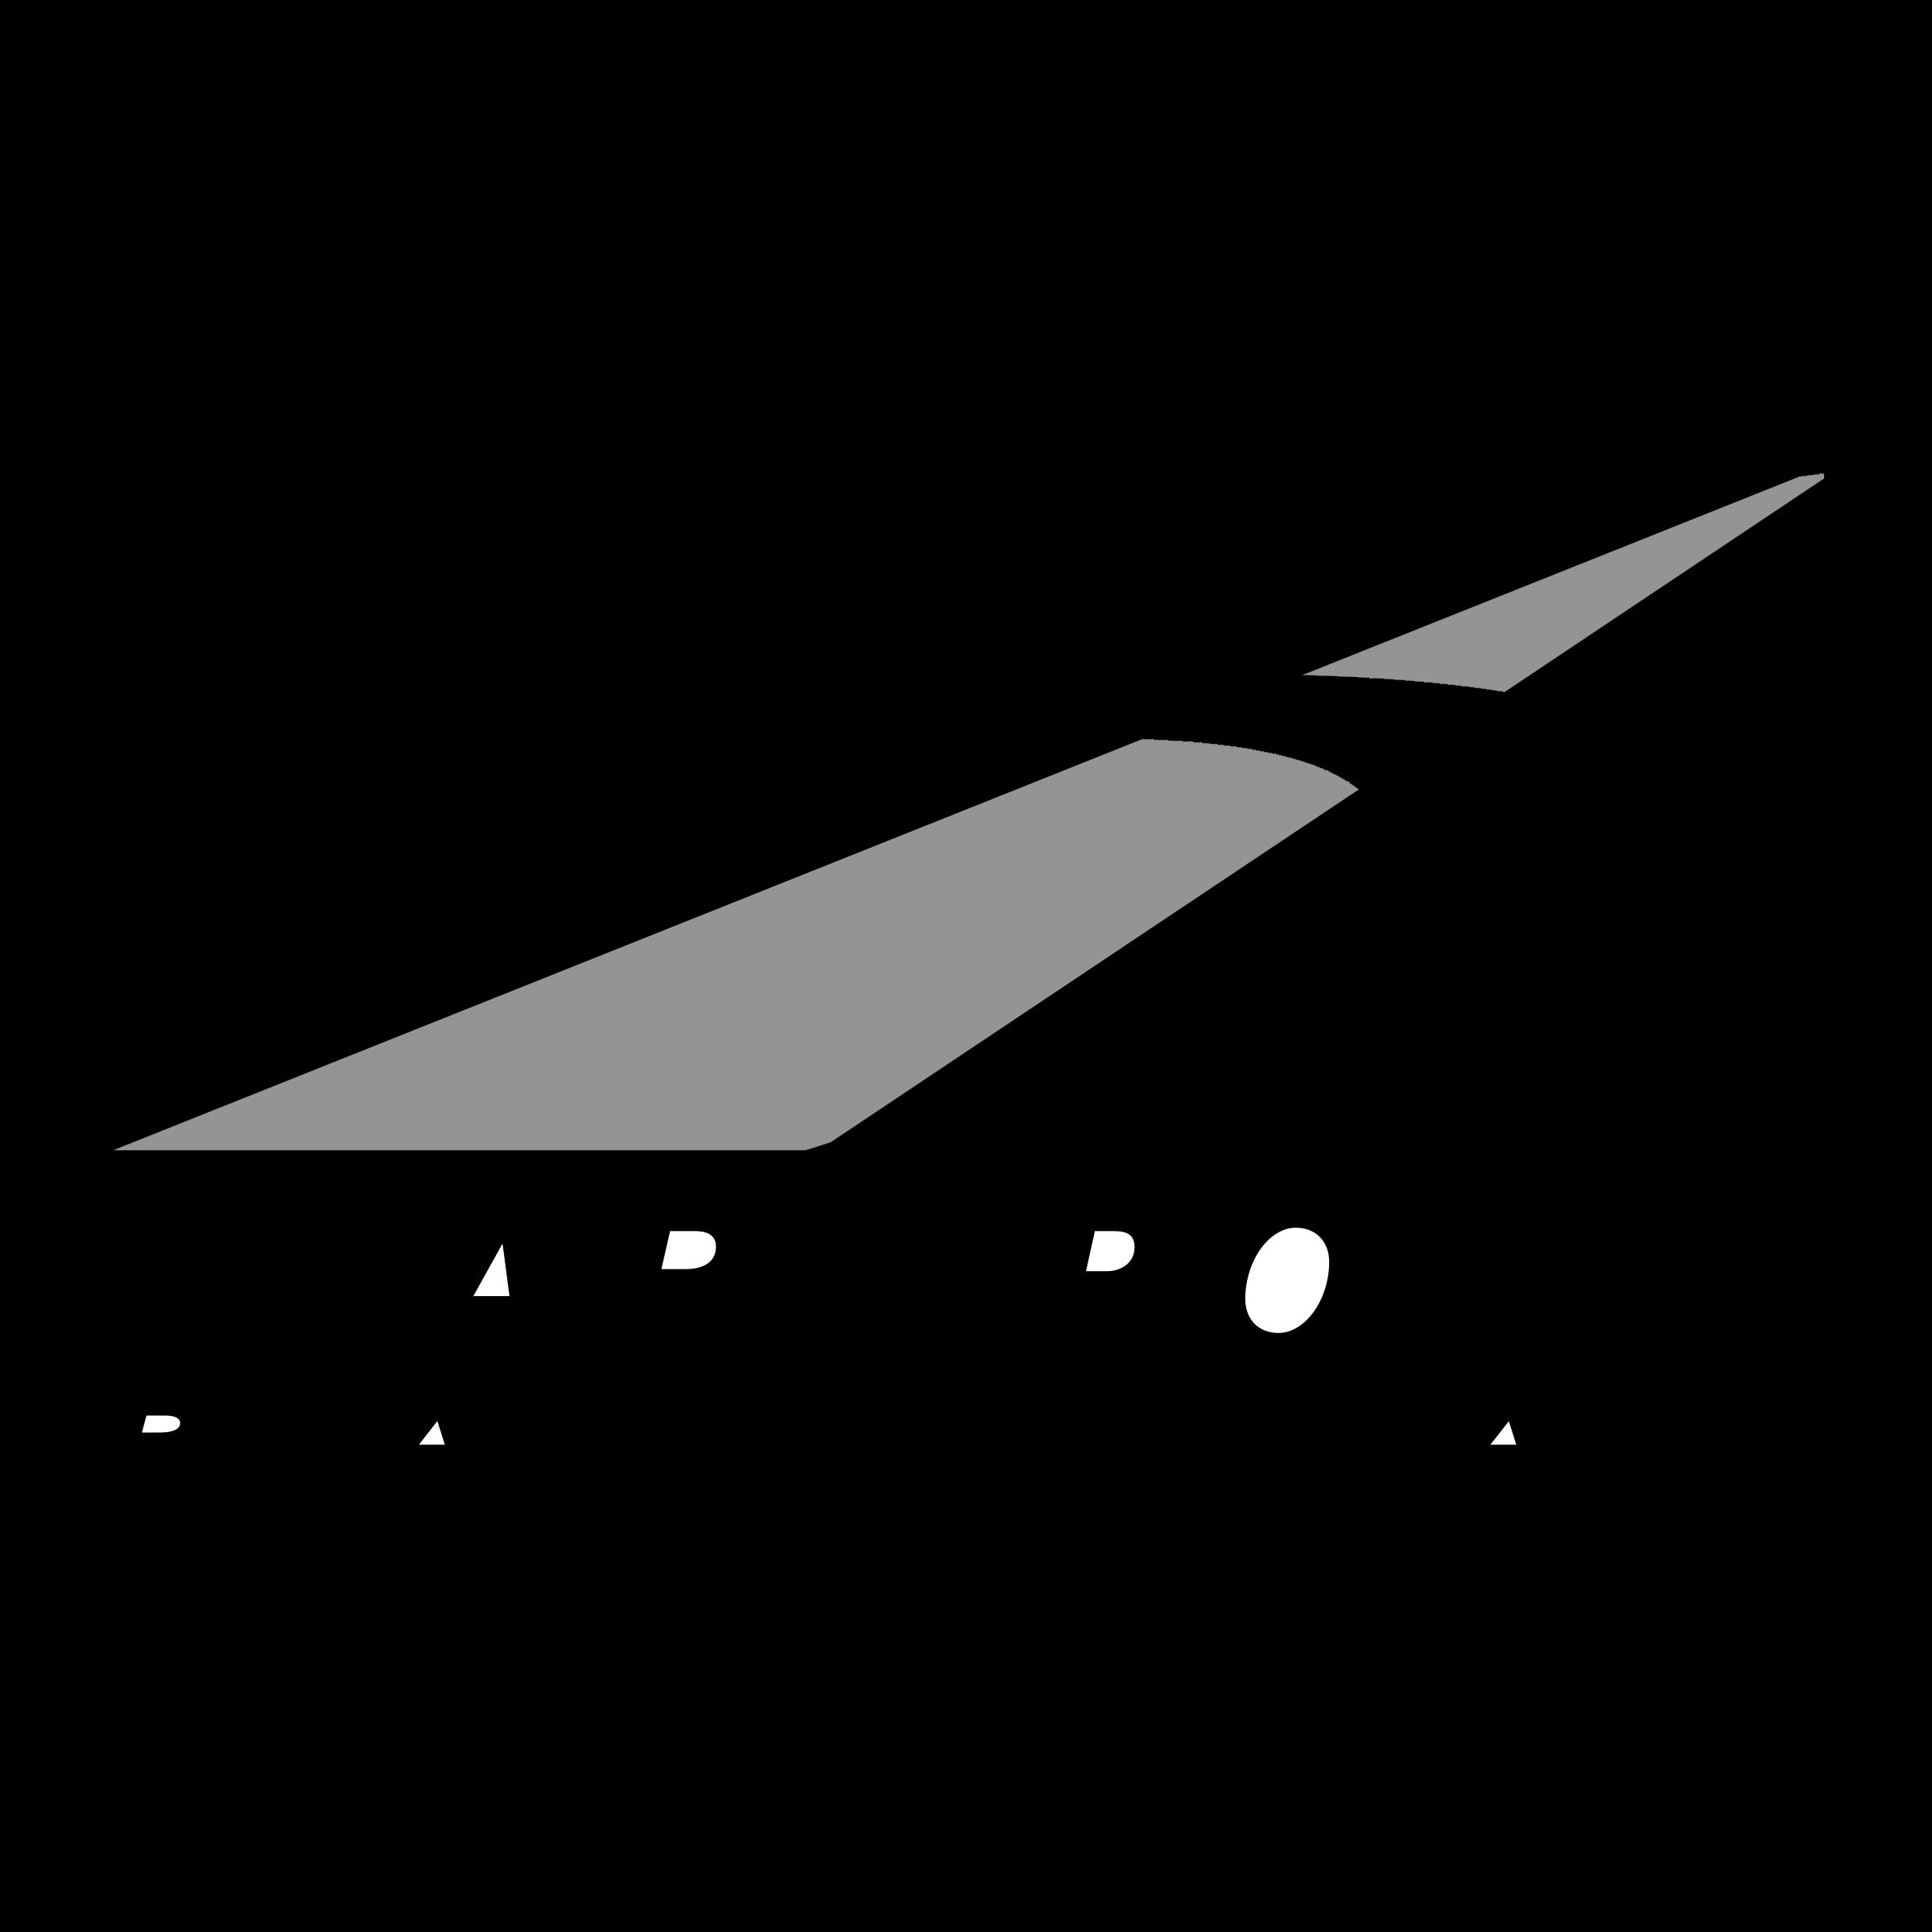 Sears Point Raceway Logo PNG Transparent